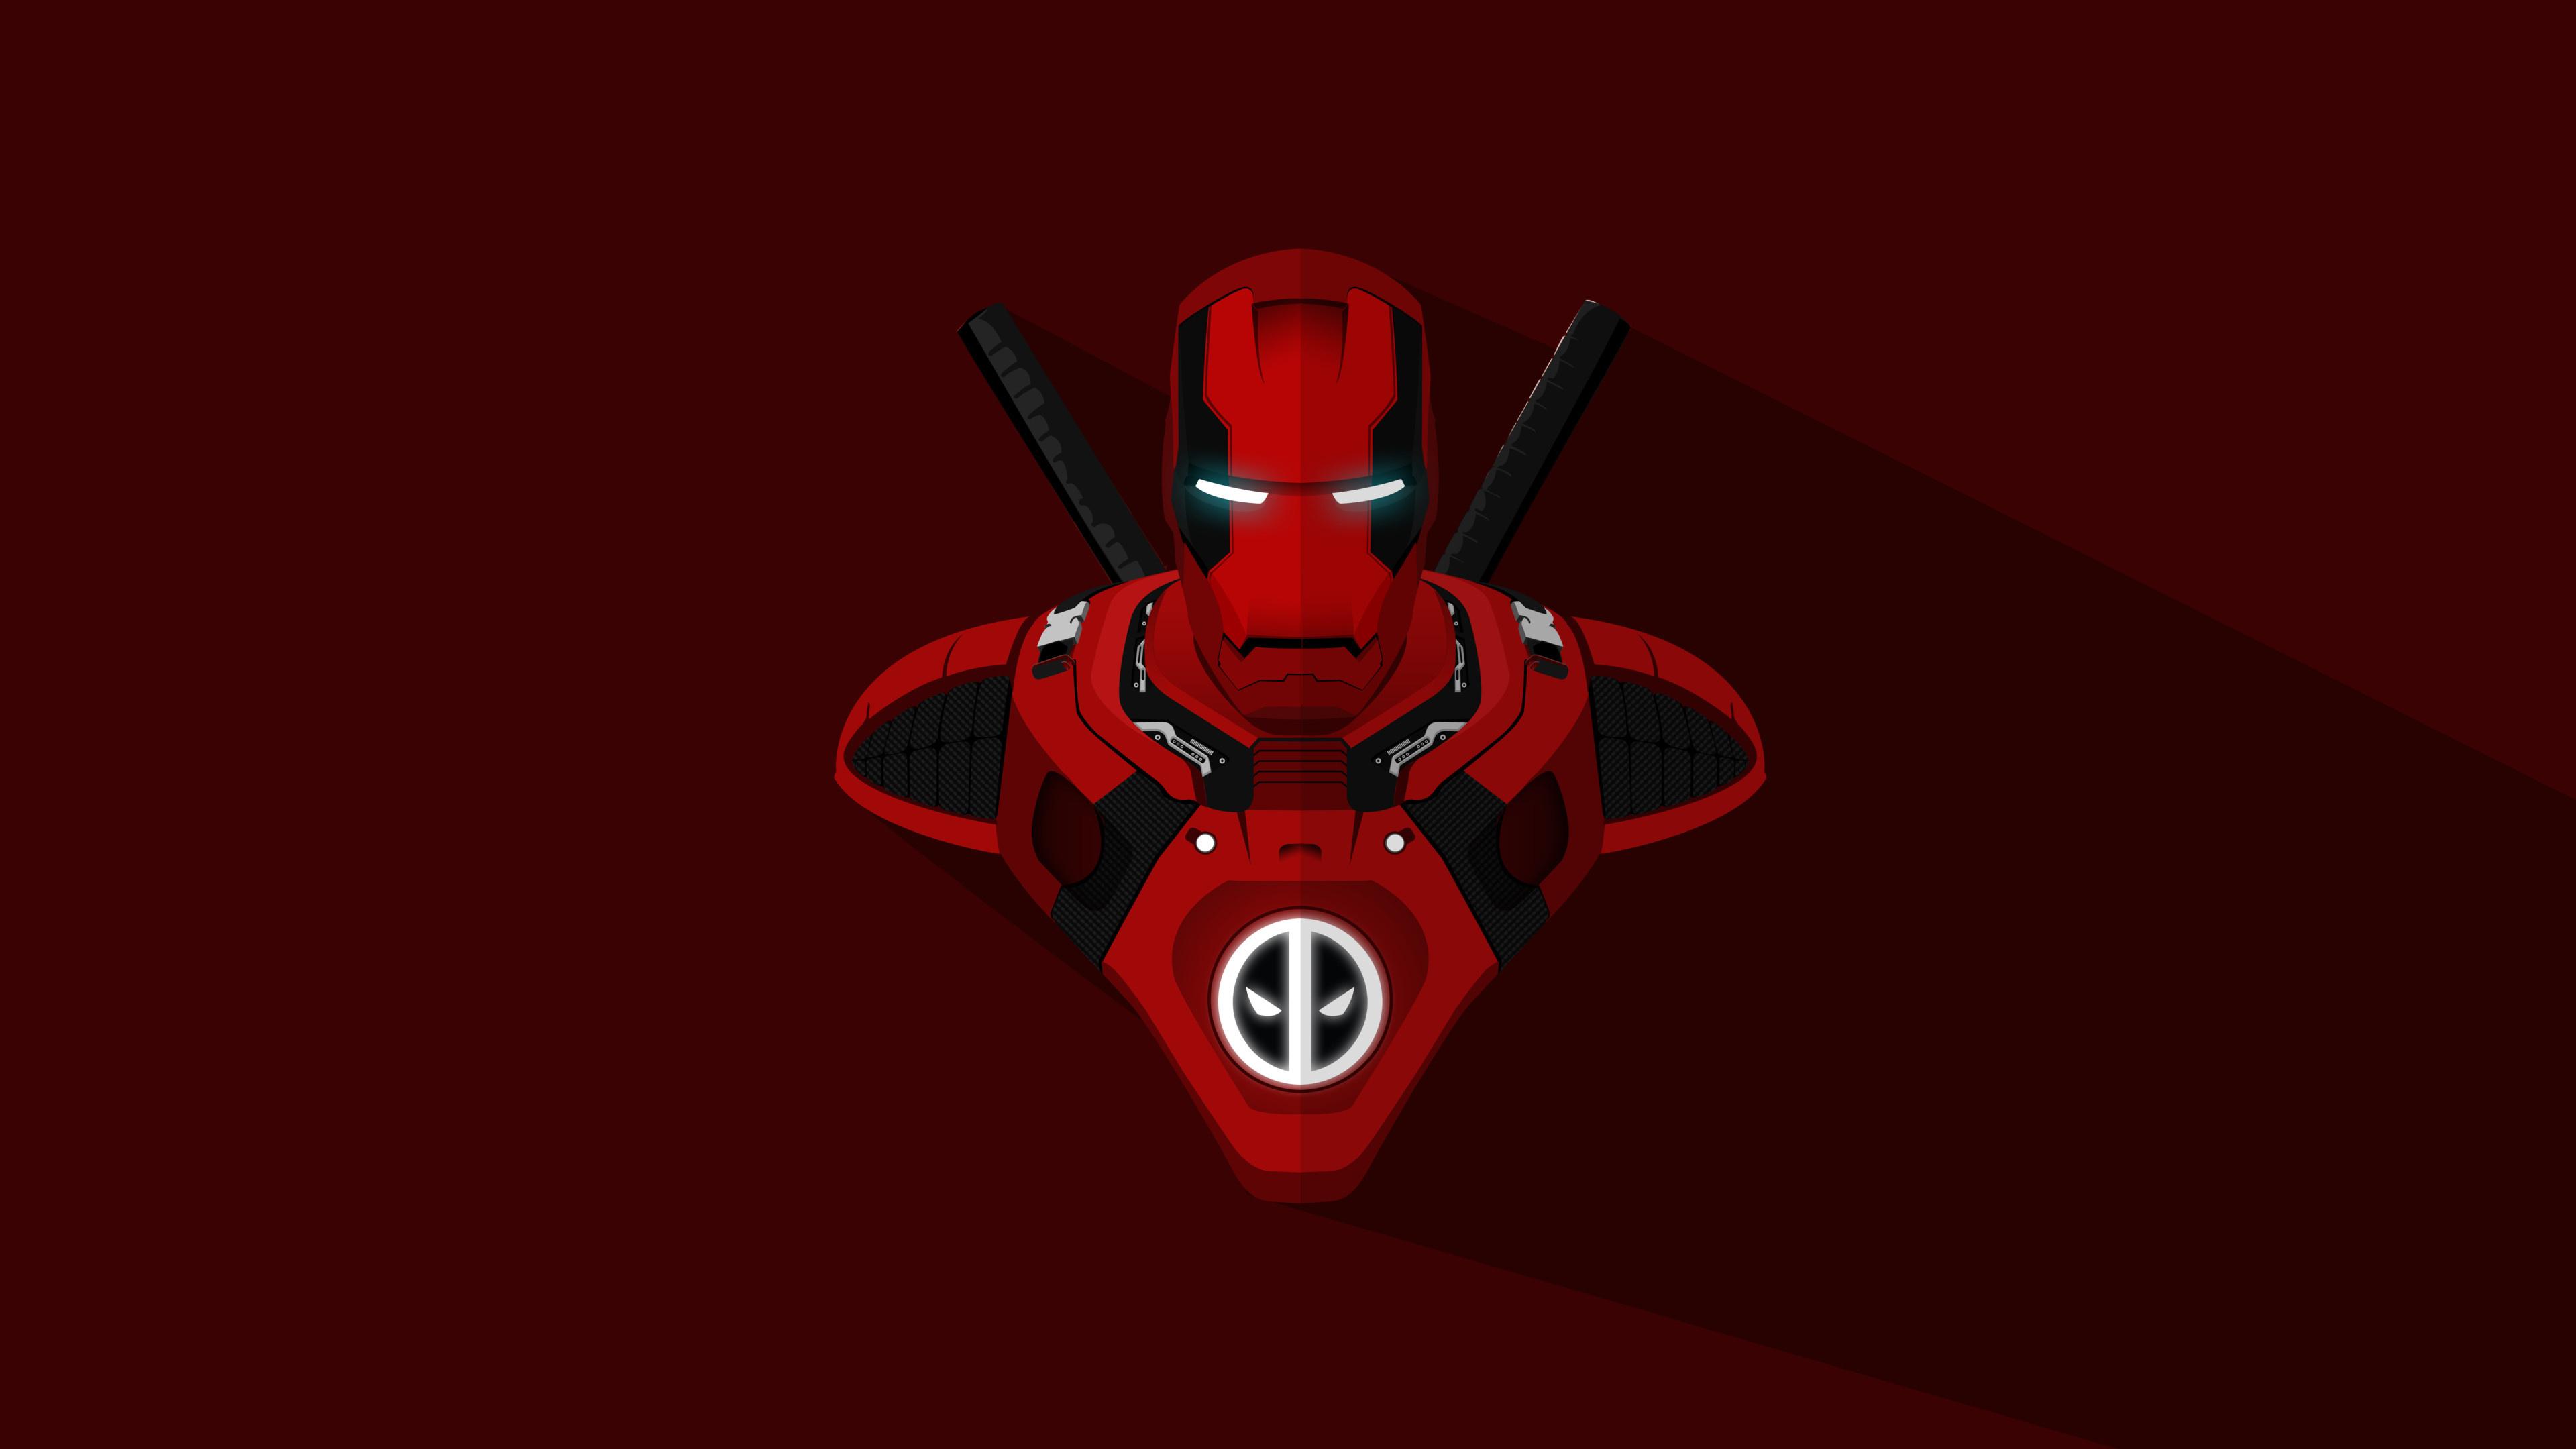 Download 3840x2160 Wallpaper Iron Man Deadpool Crossover